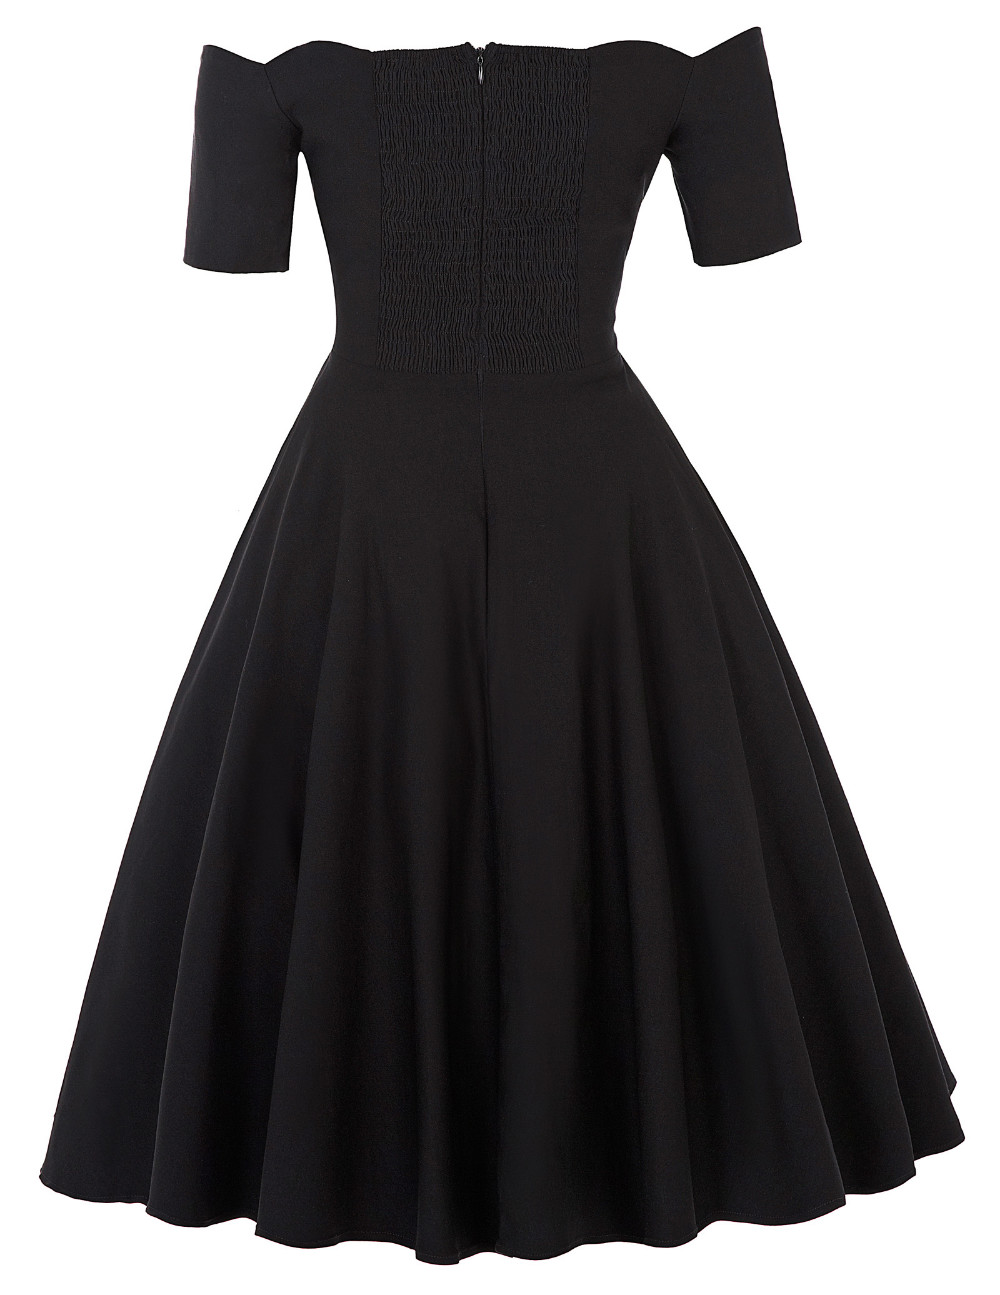 Belle Poque 17 Women Dress Robe Vintage Off Shoulder Black Summer Dress Jurken 1950s 60s Retro Rockabilly Swing Party Dresses 14